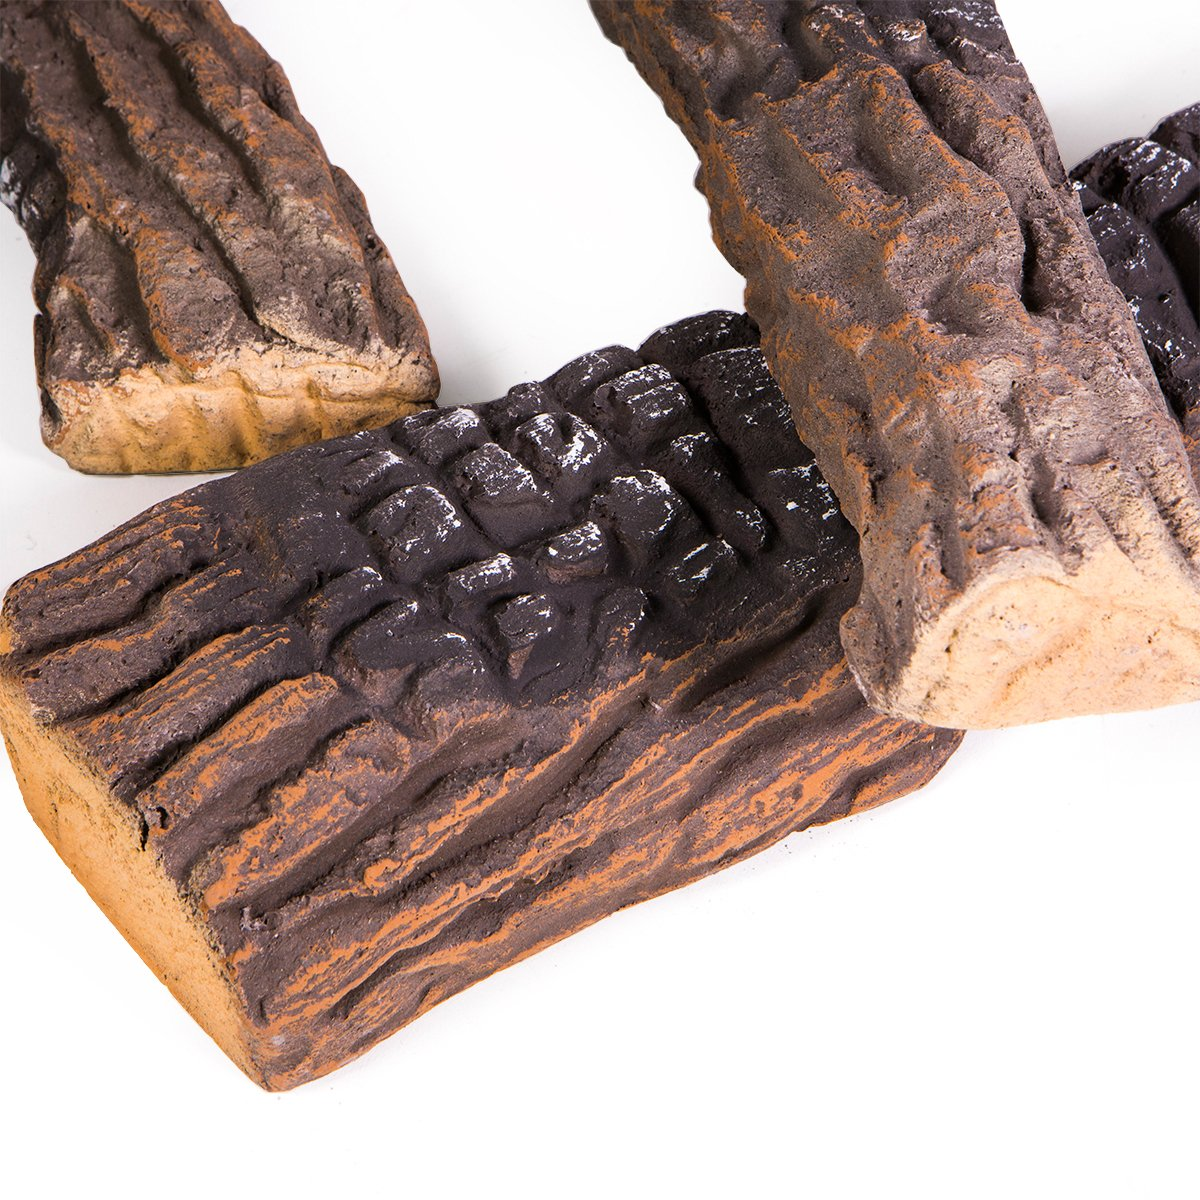 Barton Fireplace Decoration Petite Ceramic Wood, Gas Fireplace Log Set, 10 Piece by Barton (Image #4)